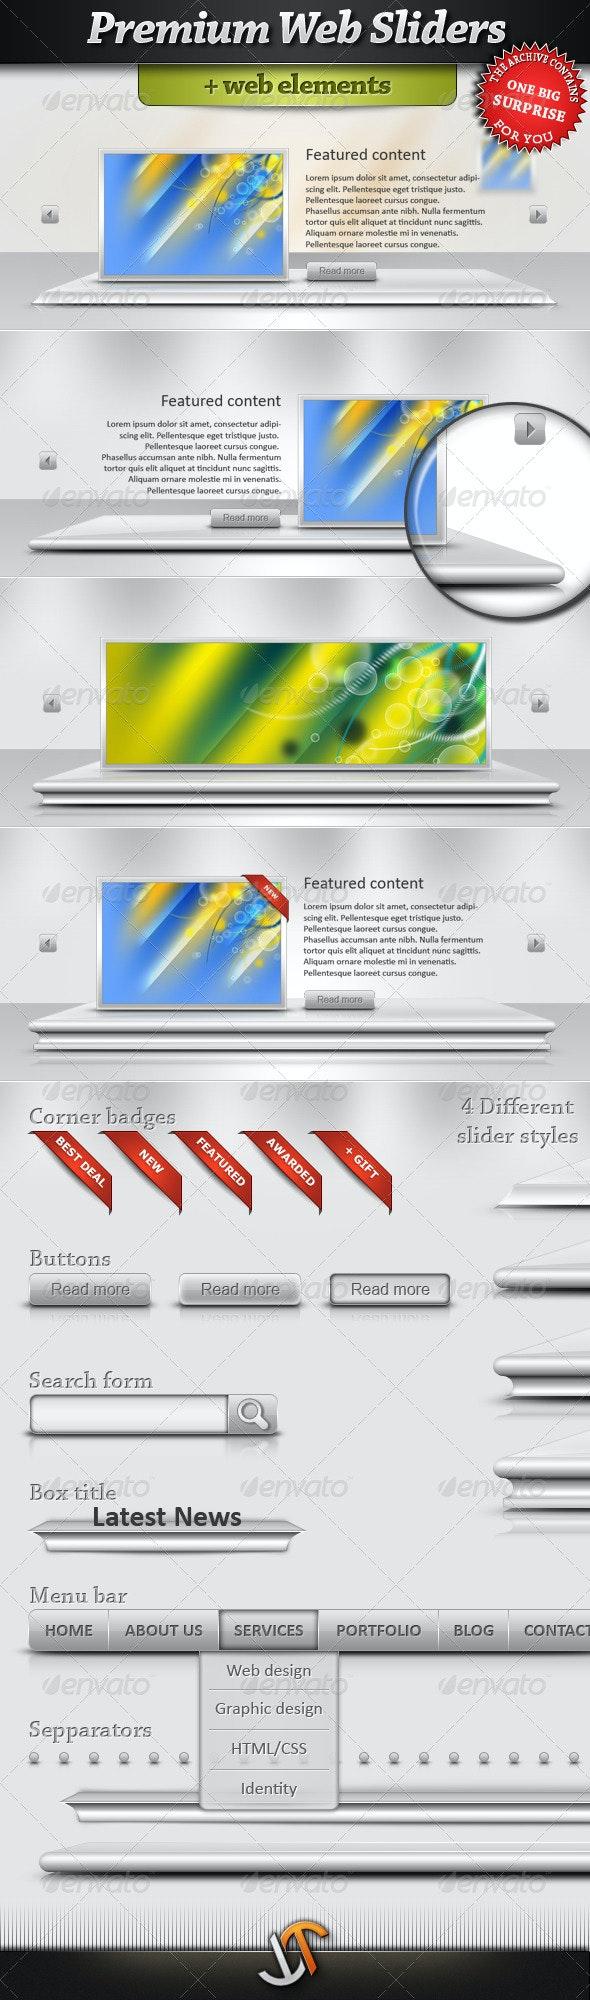 Premium Web Sliders with web element - Sliders & Features Web Elements